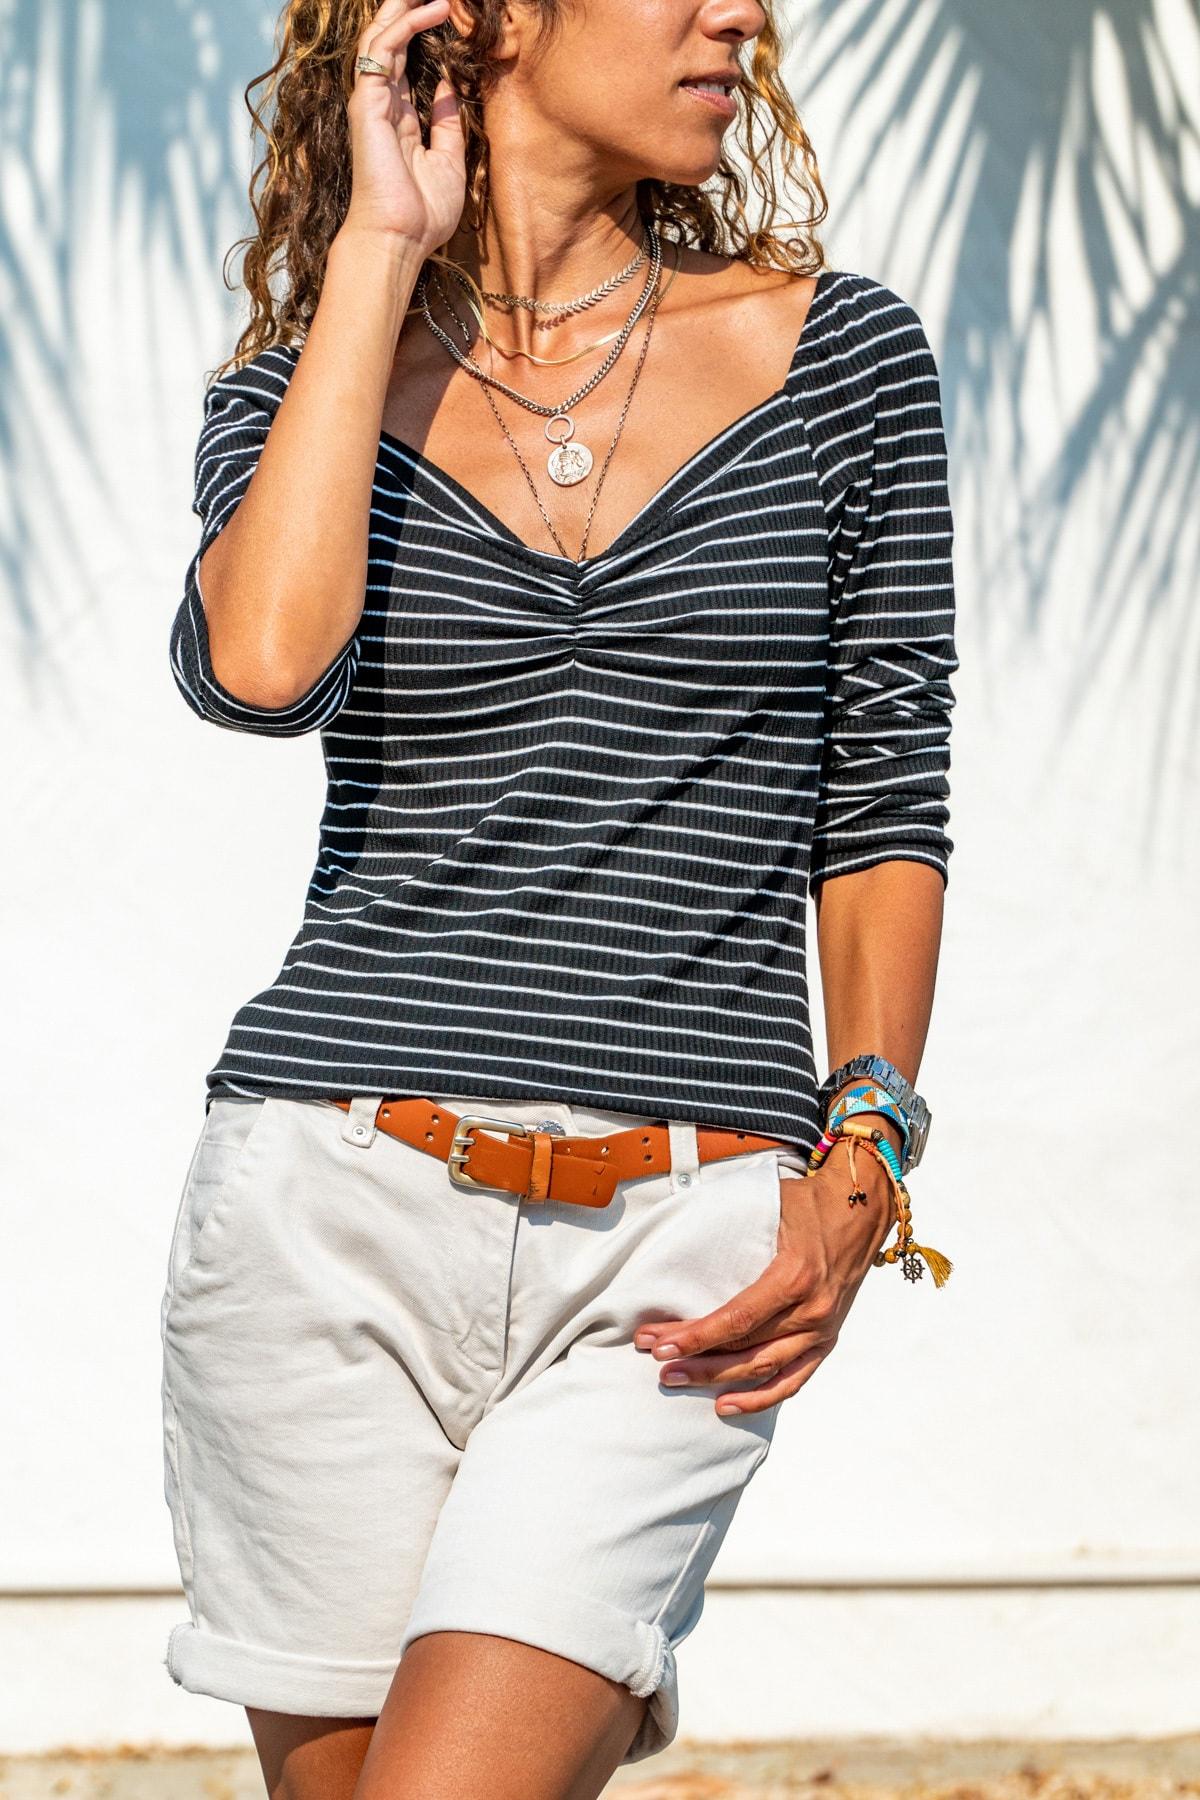 Güneşkızı Kadın Siyah-Beyaz Öpücük Yaka Omzu Lastikli Bluz GK-BST2915